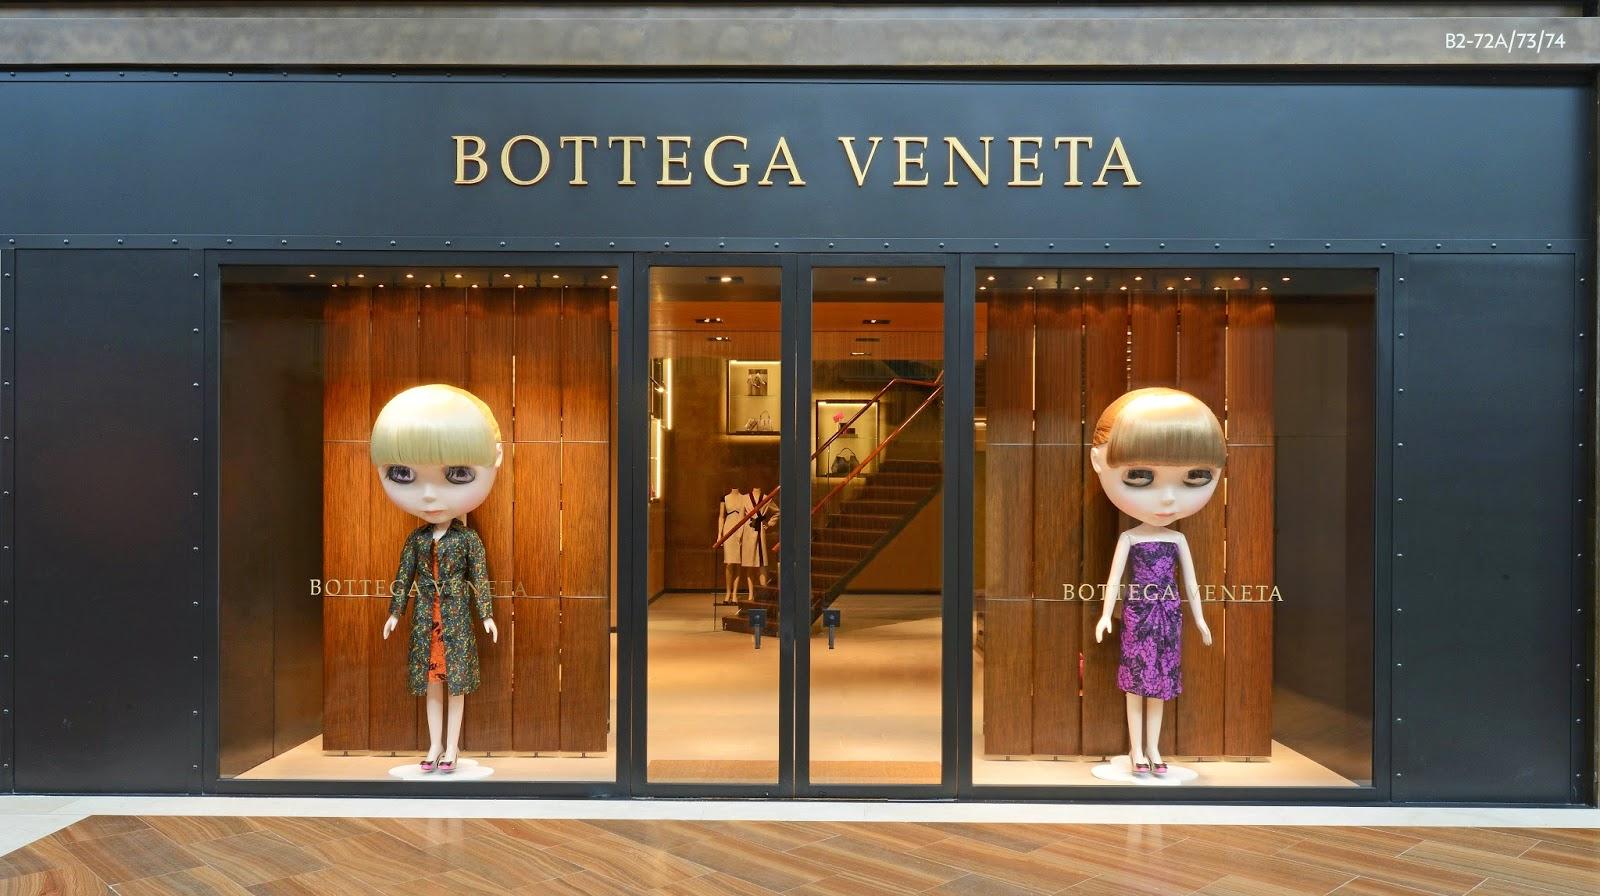 Bottega Veneta's Store Re-Opening at Marina Bay Sands